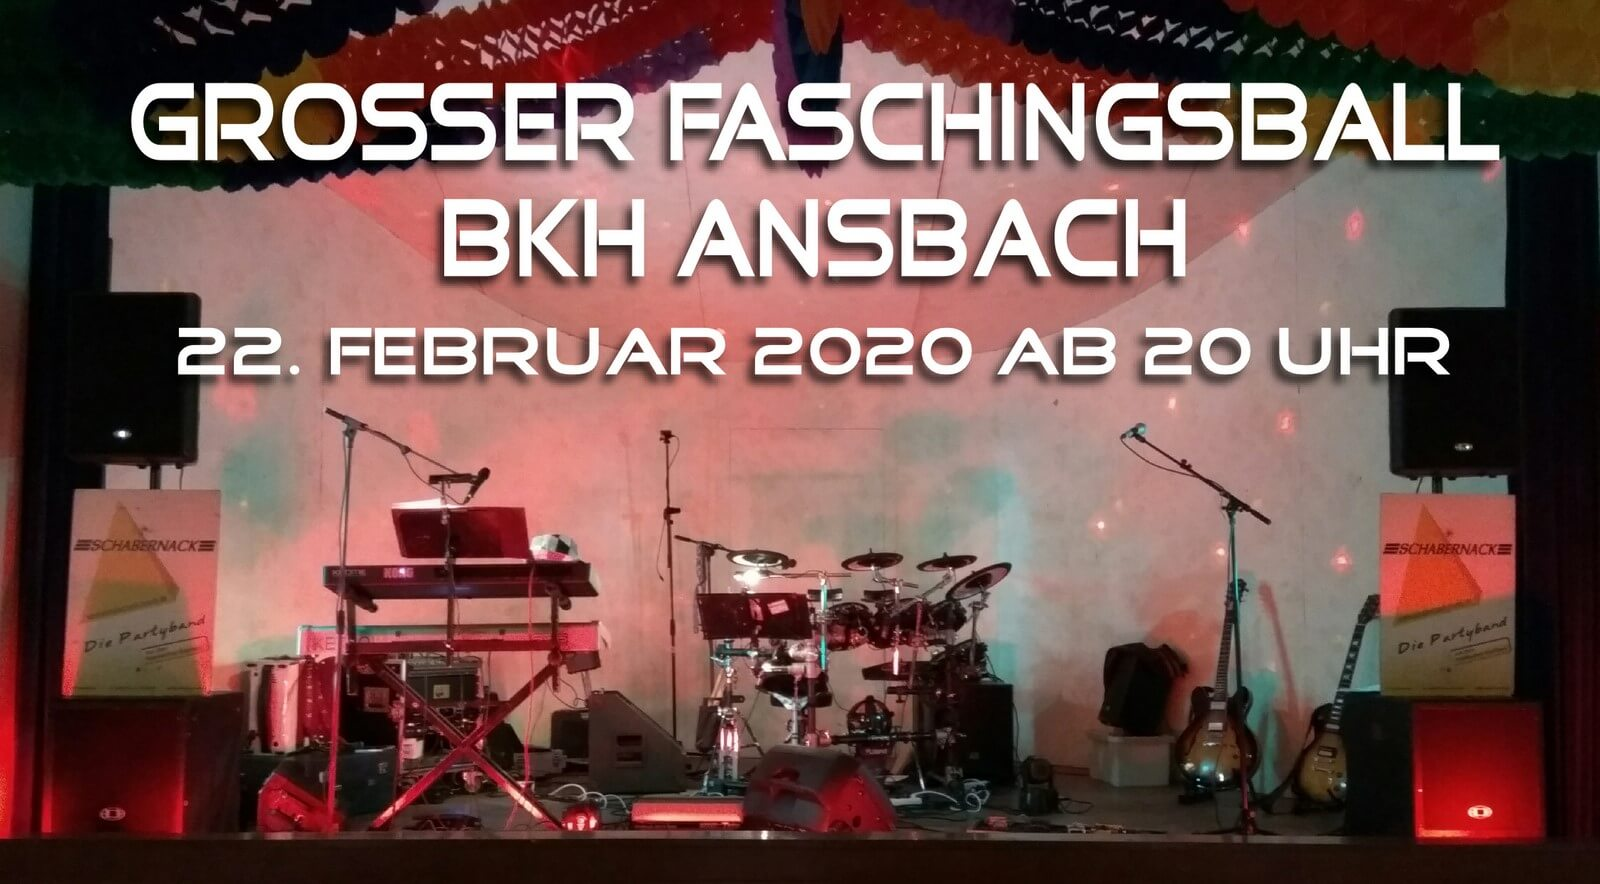 Faschingsball BKH Ansbach 2020